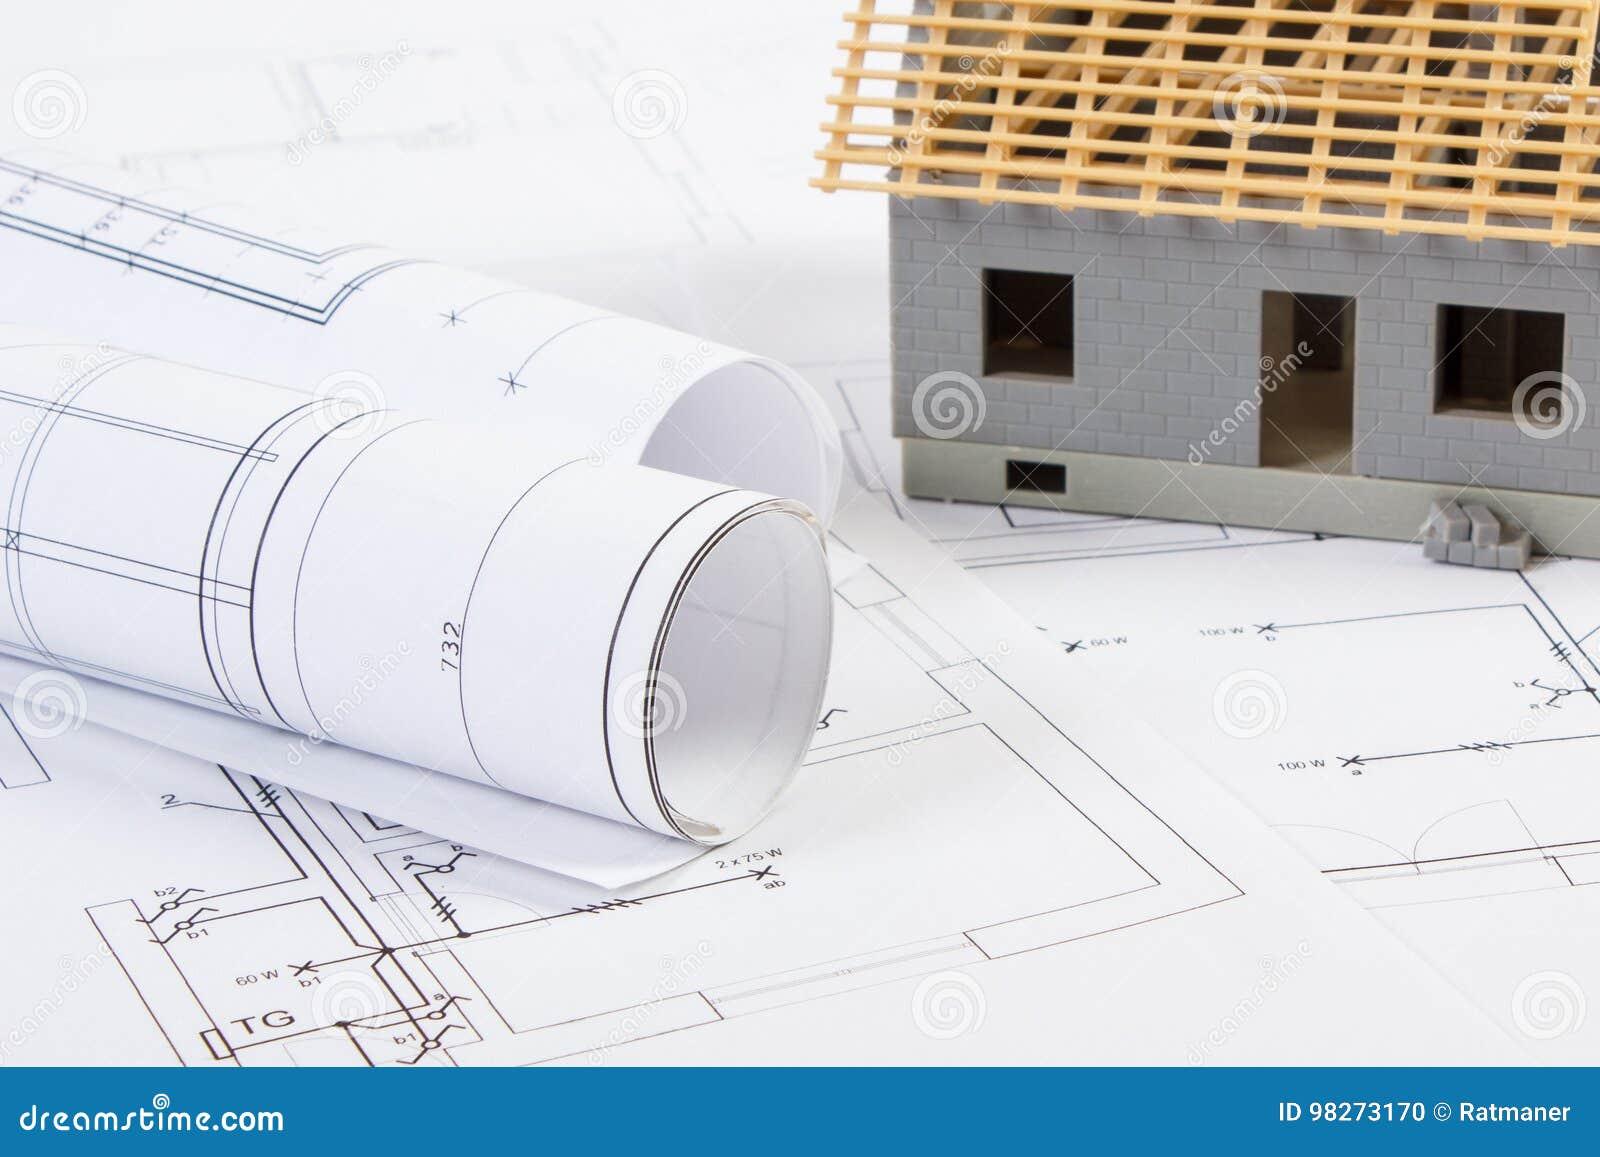 d635d5f732e3 Μικρό σπίτι κάτω από την κατασκευή με τους ηλεκτρικούς ρόλους των  διαγραμμάτων και των σχεδίων για το πρόγραμμα